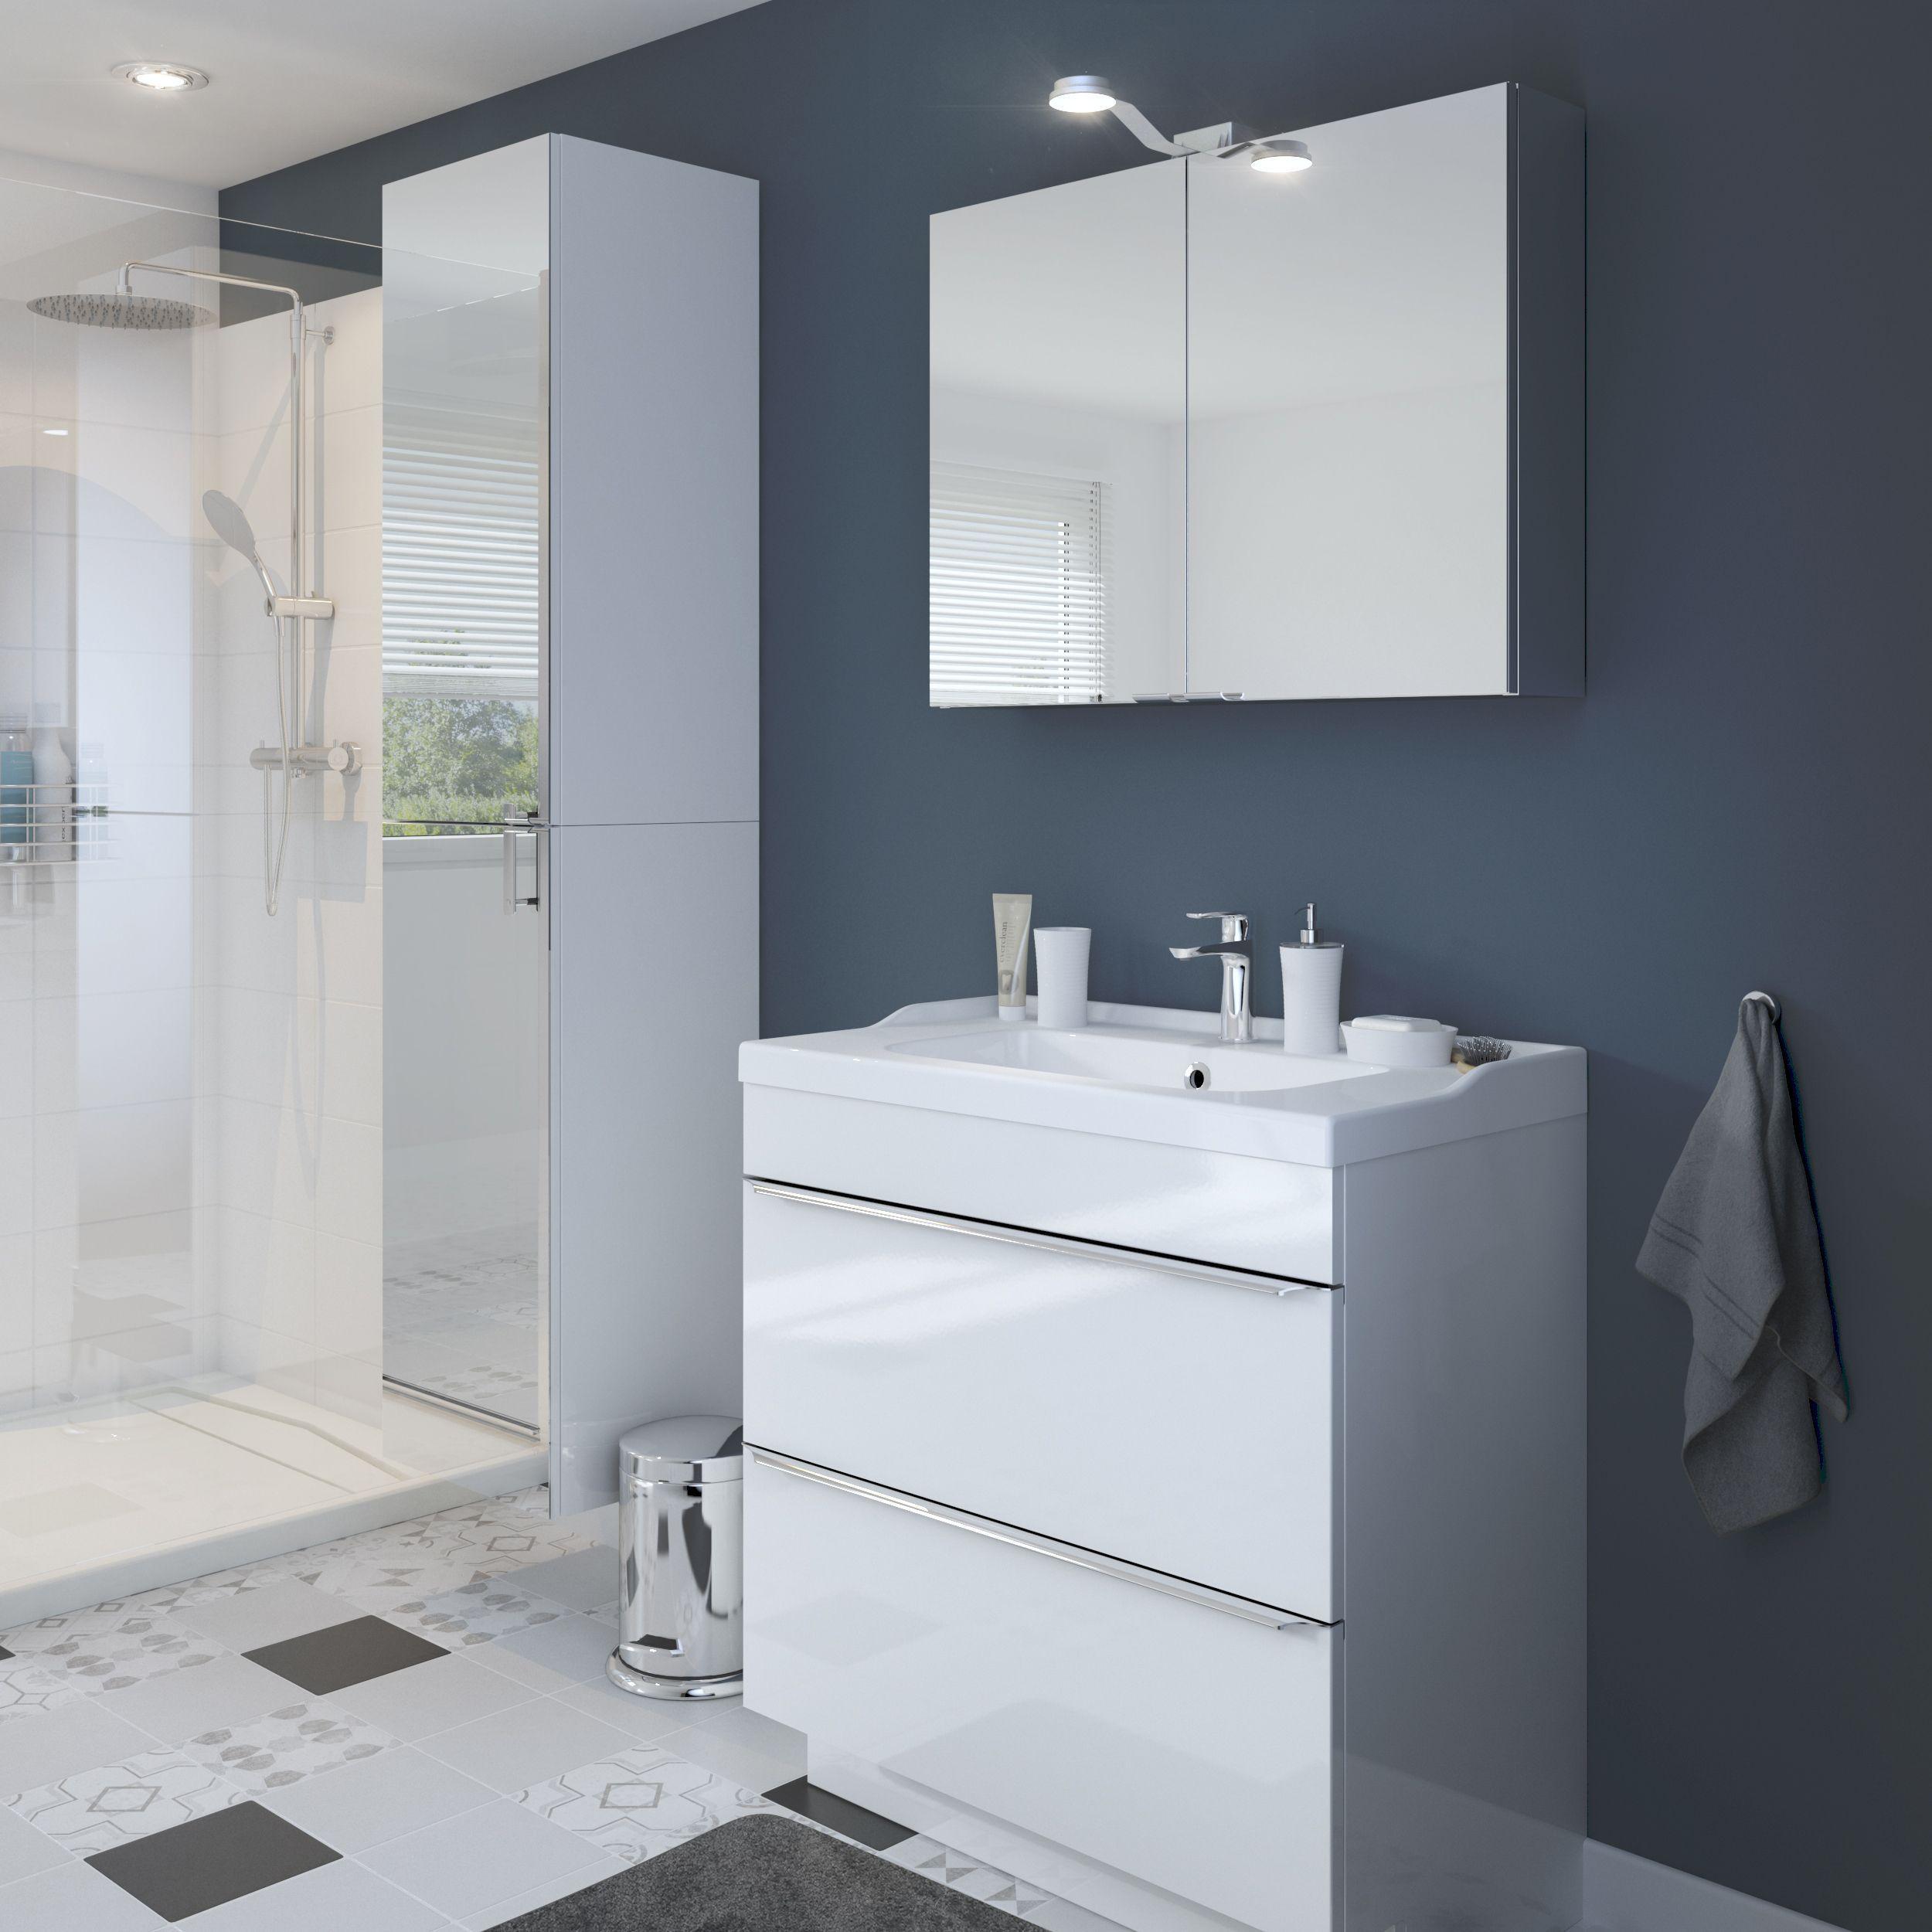 22+ Double sink vanity unit bq ideas